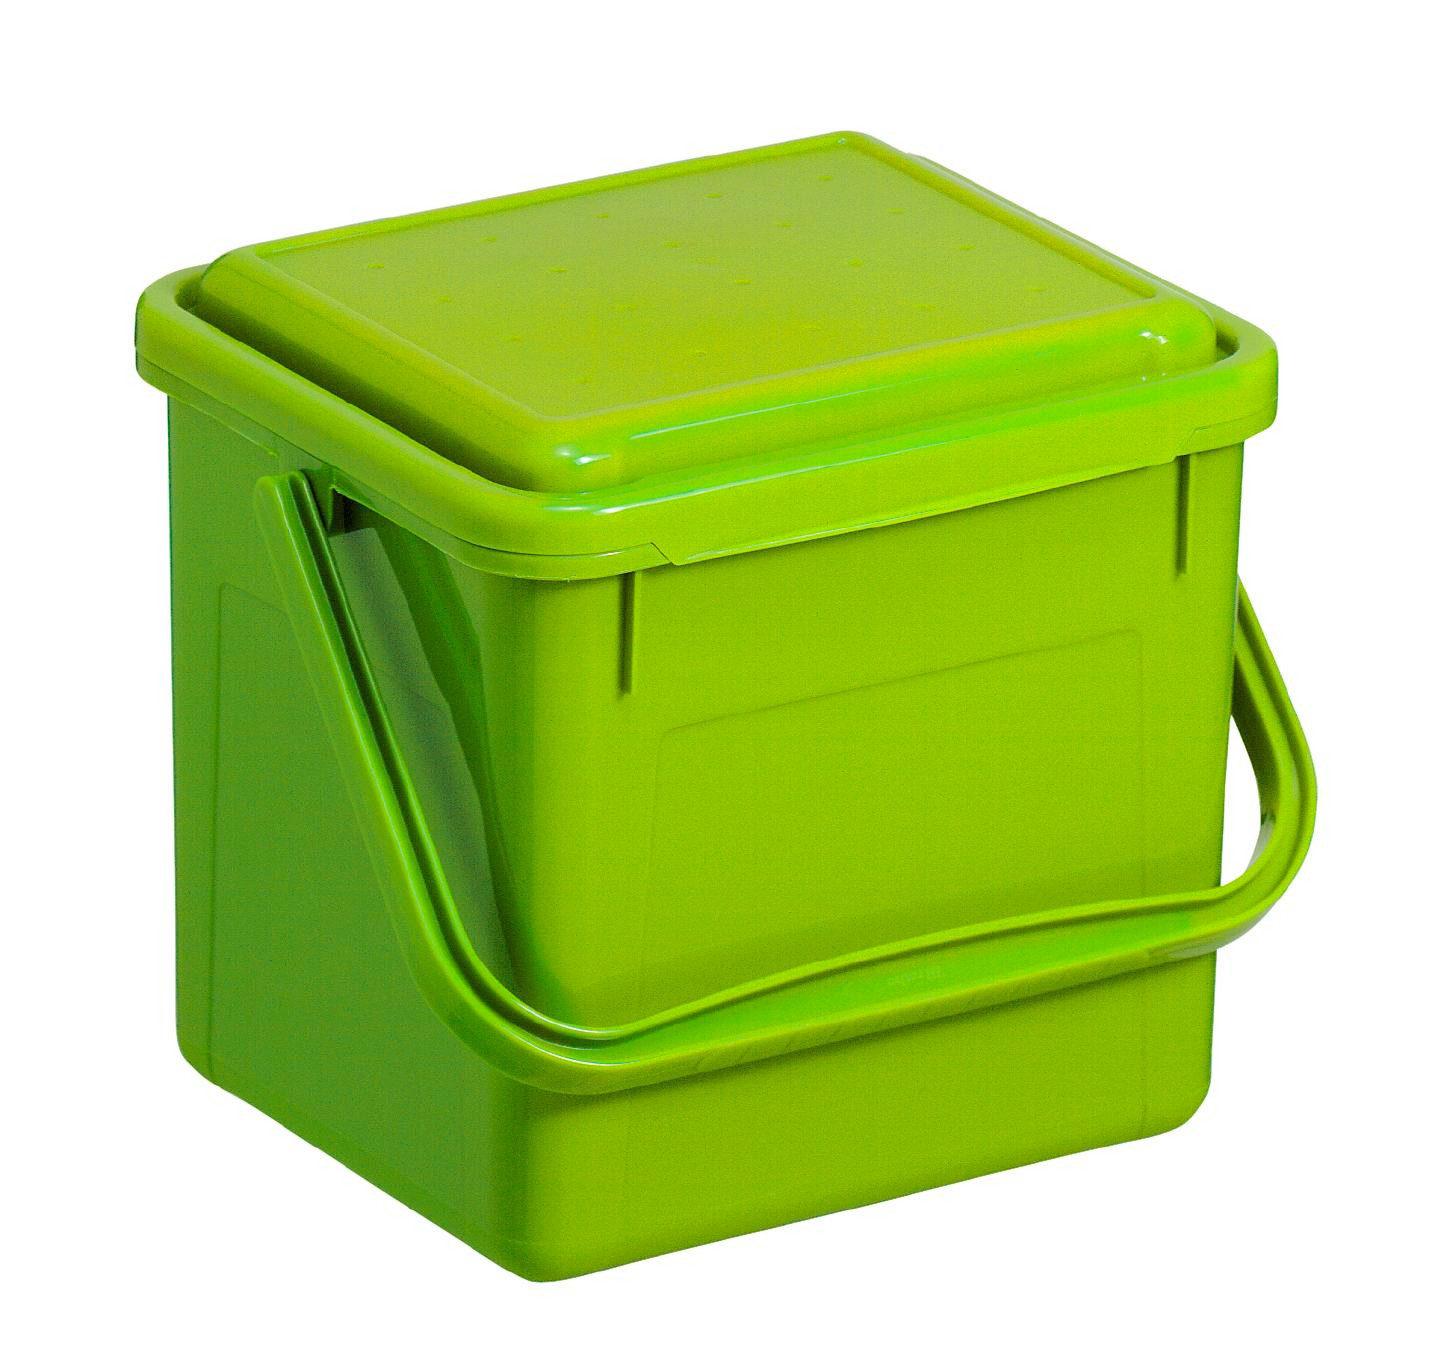 KANTA ZA SMEĆE - Zelena, Konvencionalno, Plastika (21/20/18cm) - Rotho